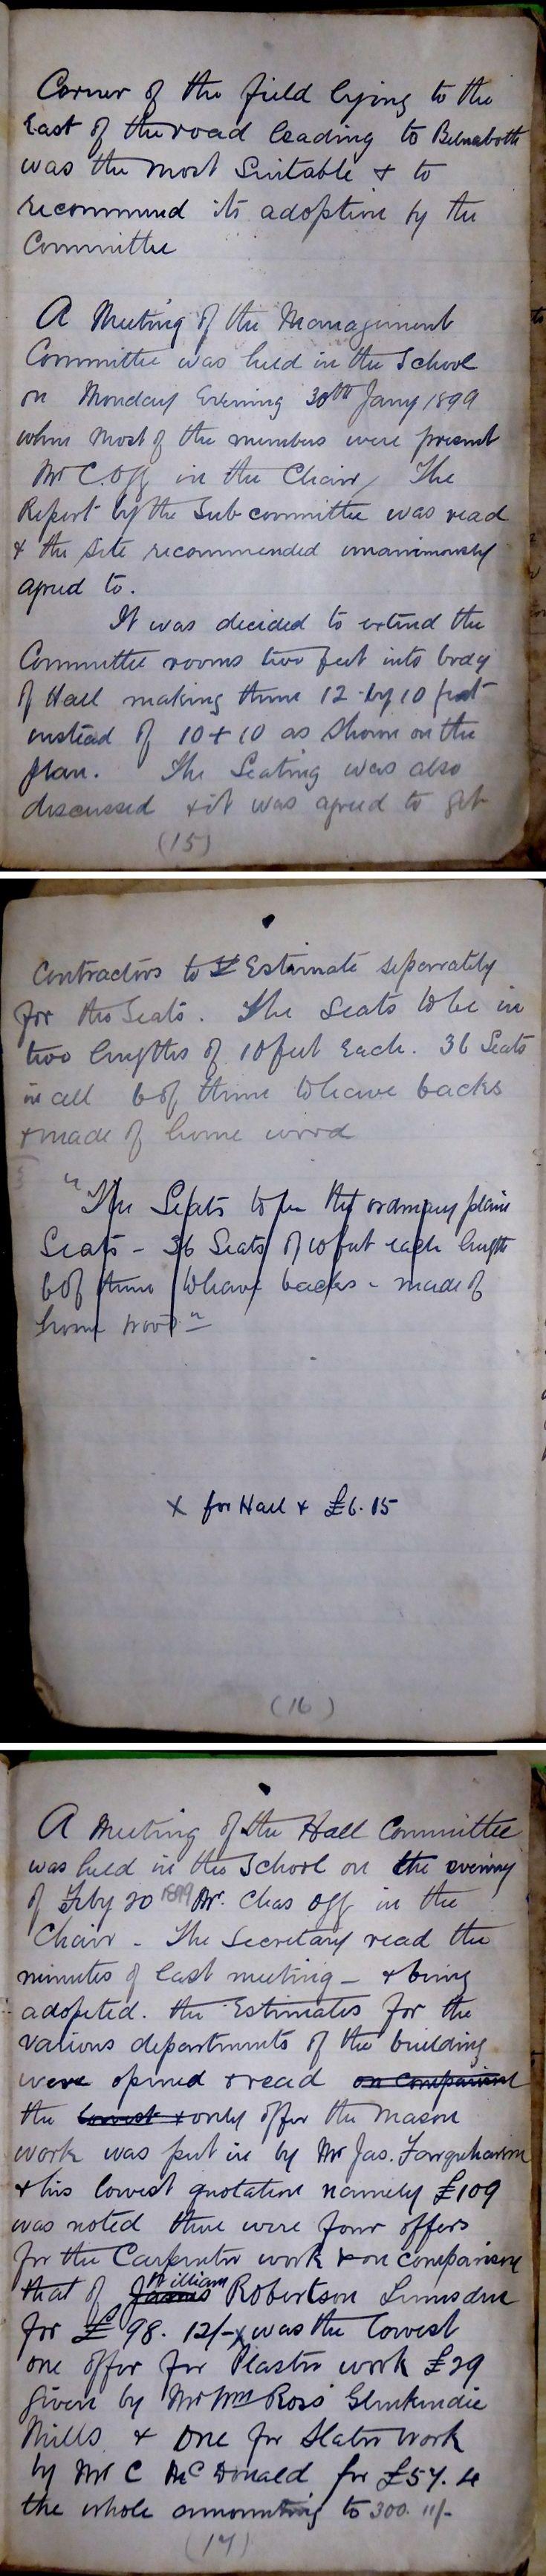 6  Glenbuchat Hall Committee Minutes